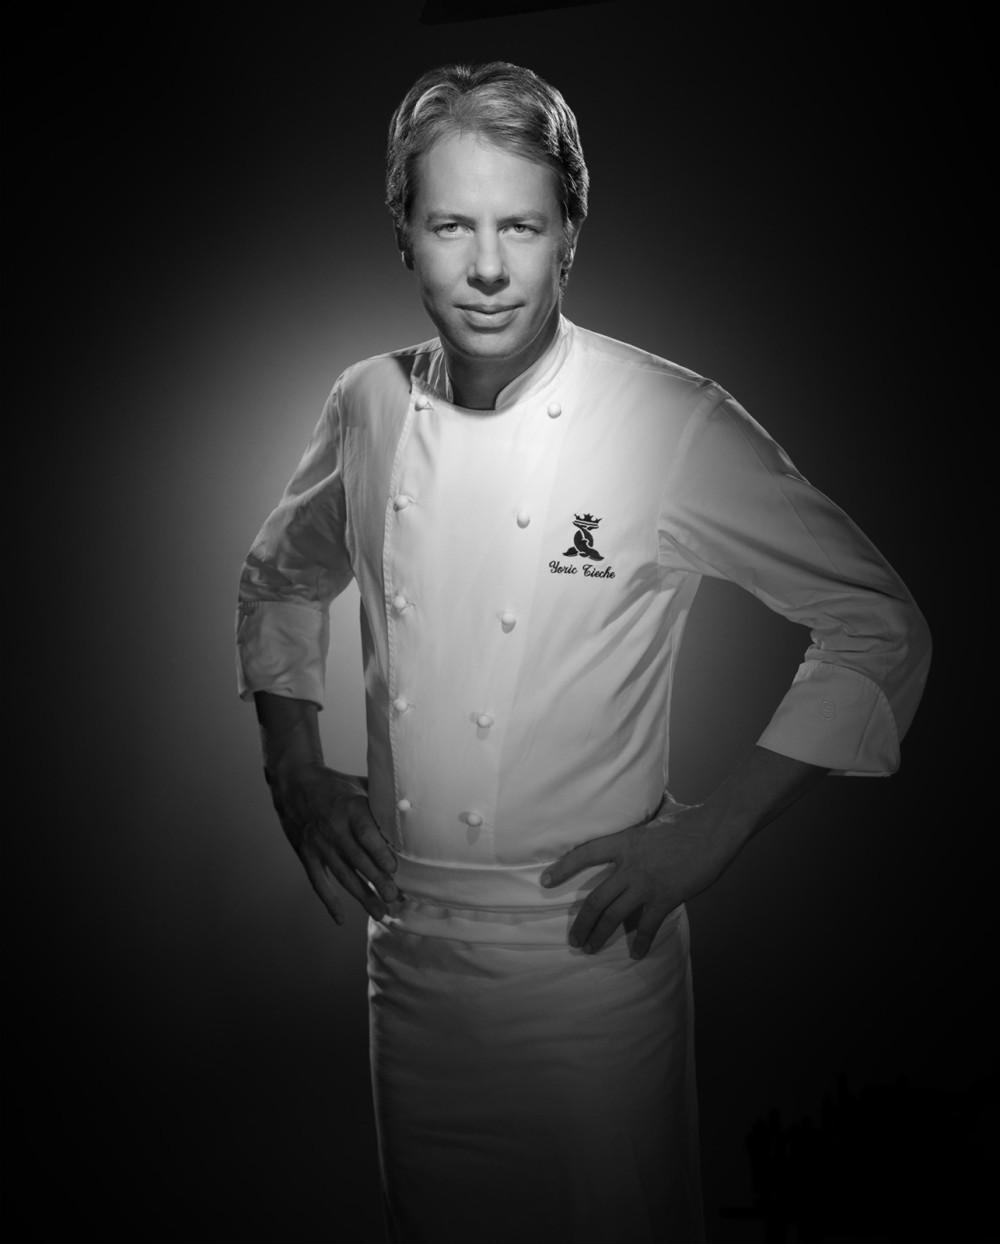 Chef Yoric Tièche ©fscapferrat